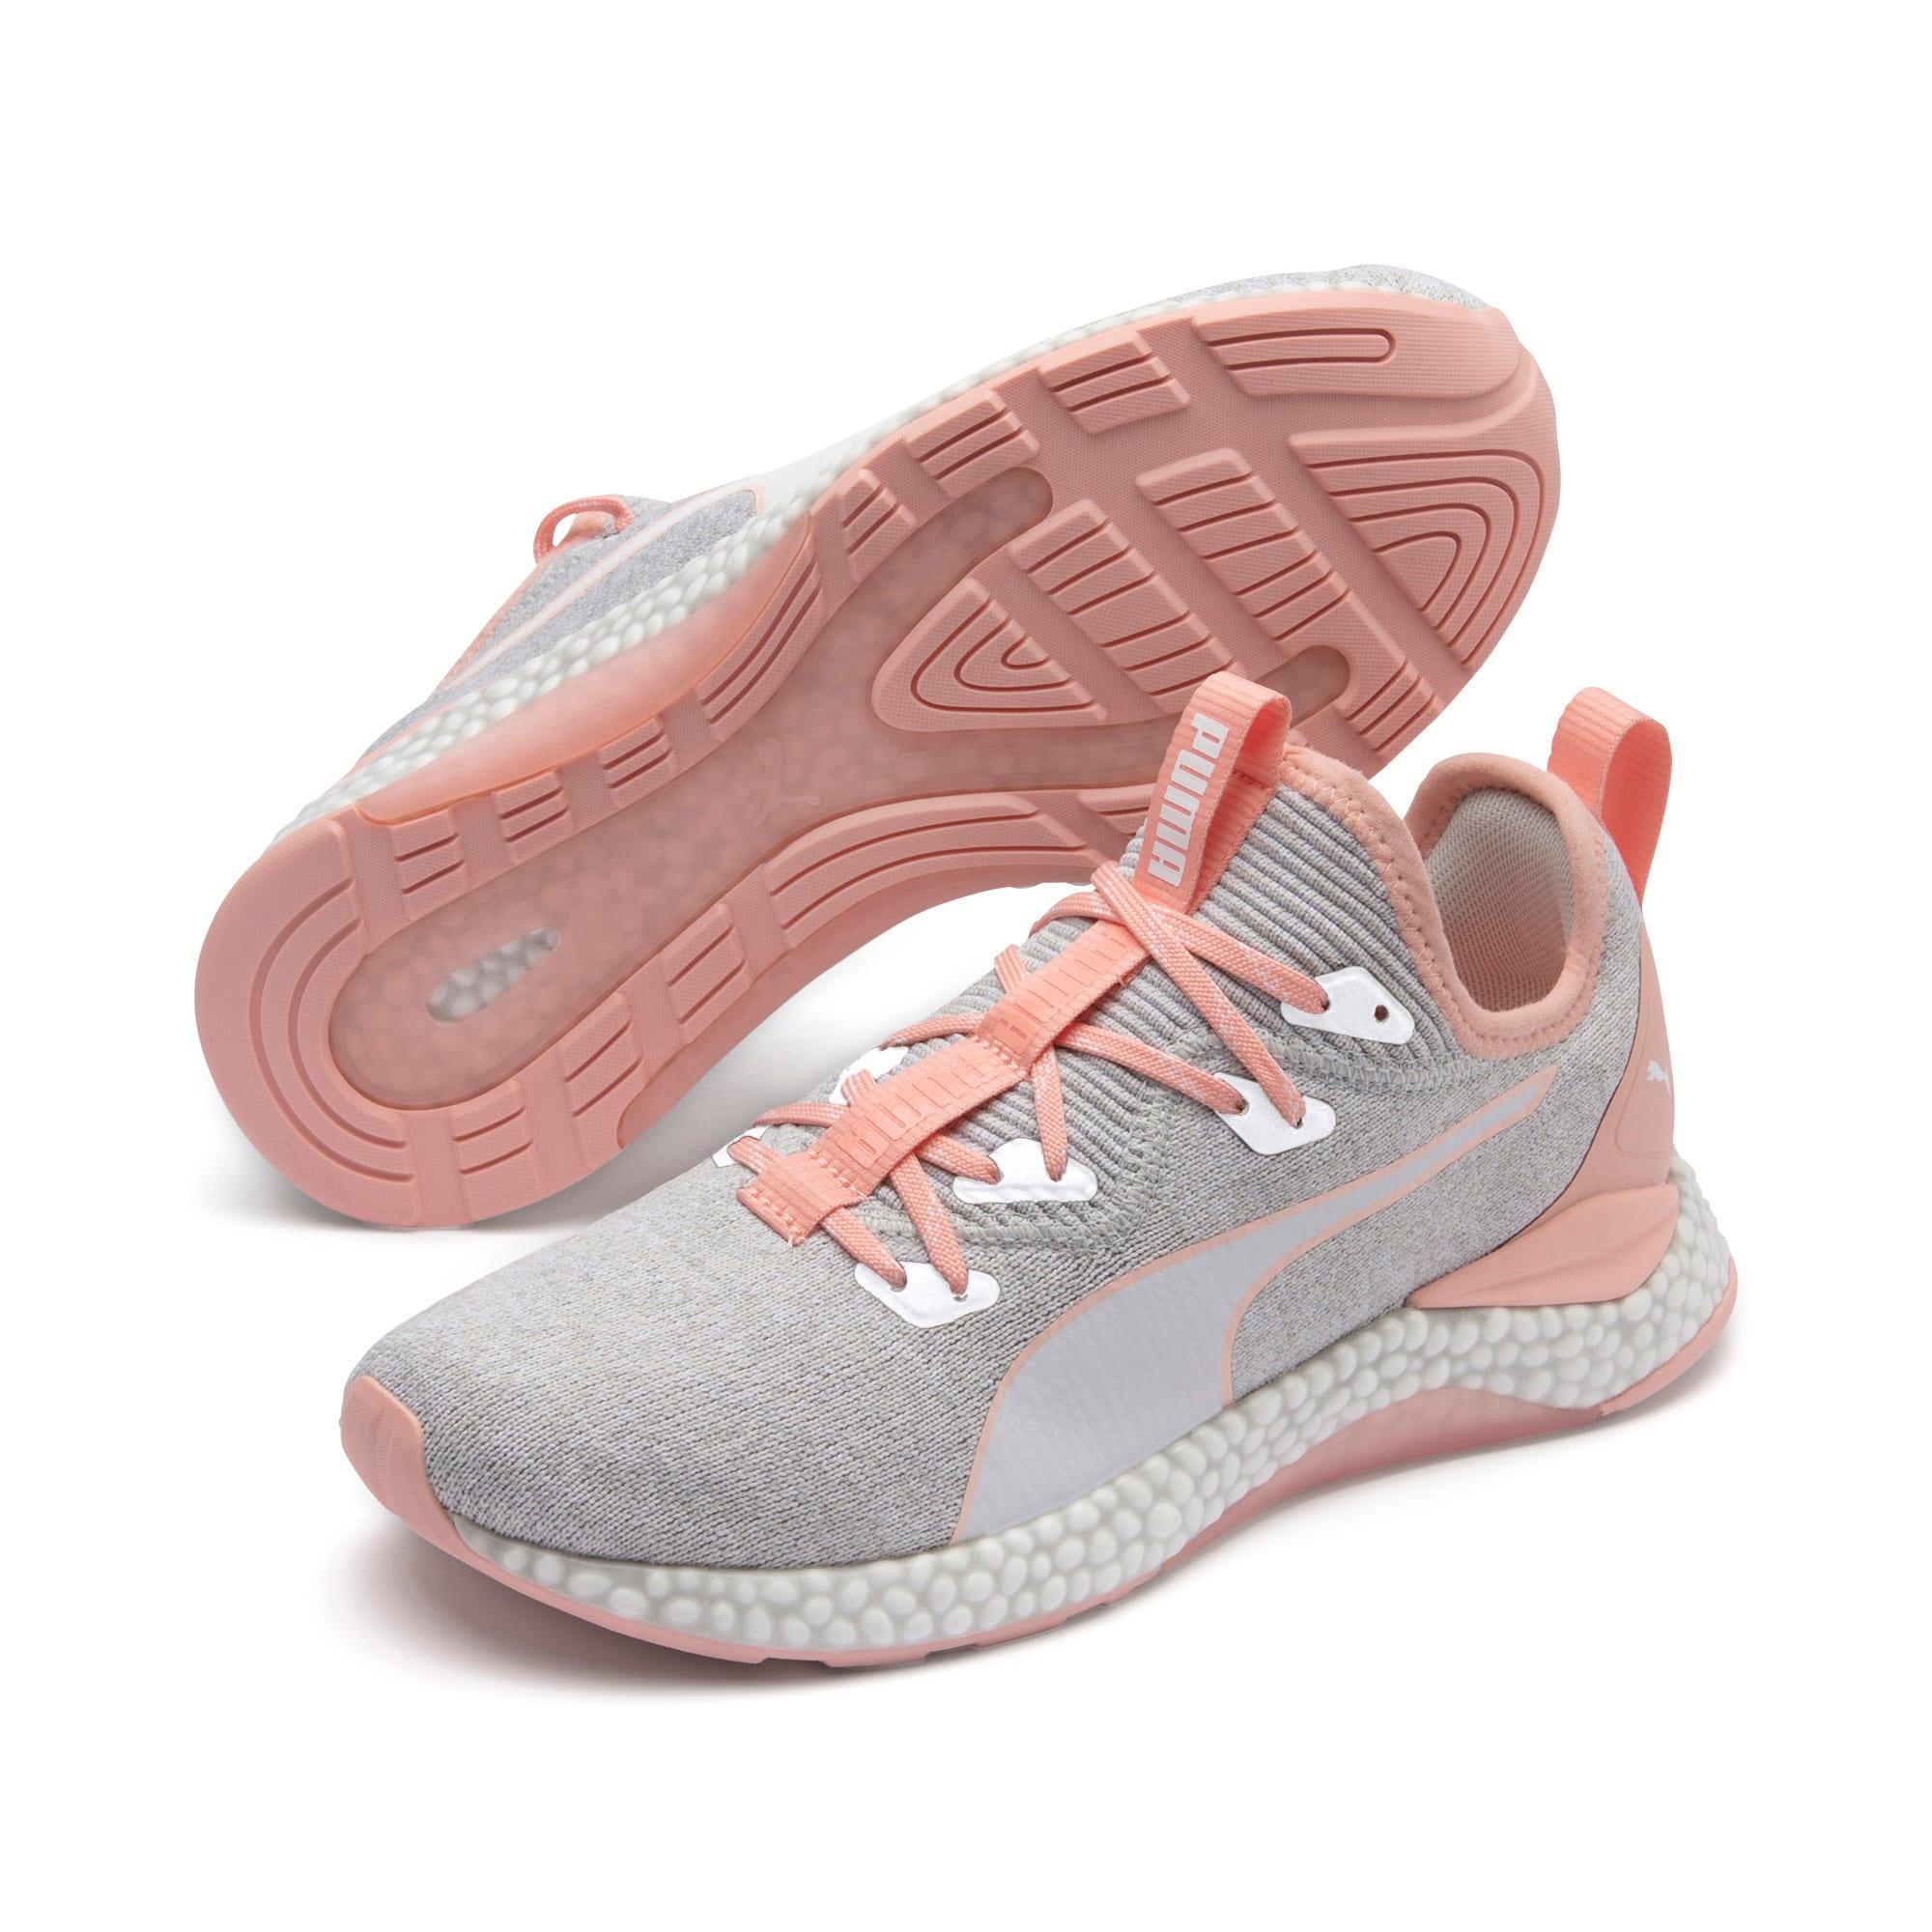 Thumbnail 3 of HYBRID Runner Women's Running Shoes, Glacier Gray-Peach Bud, medium